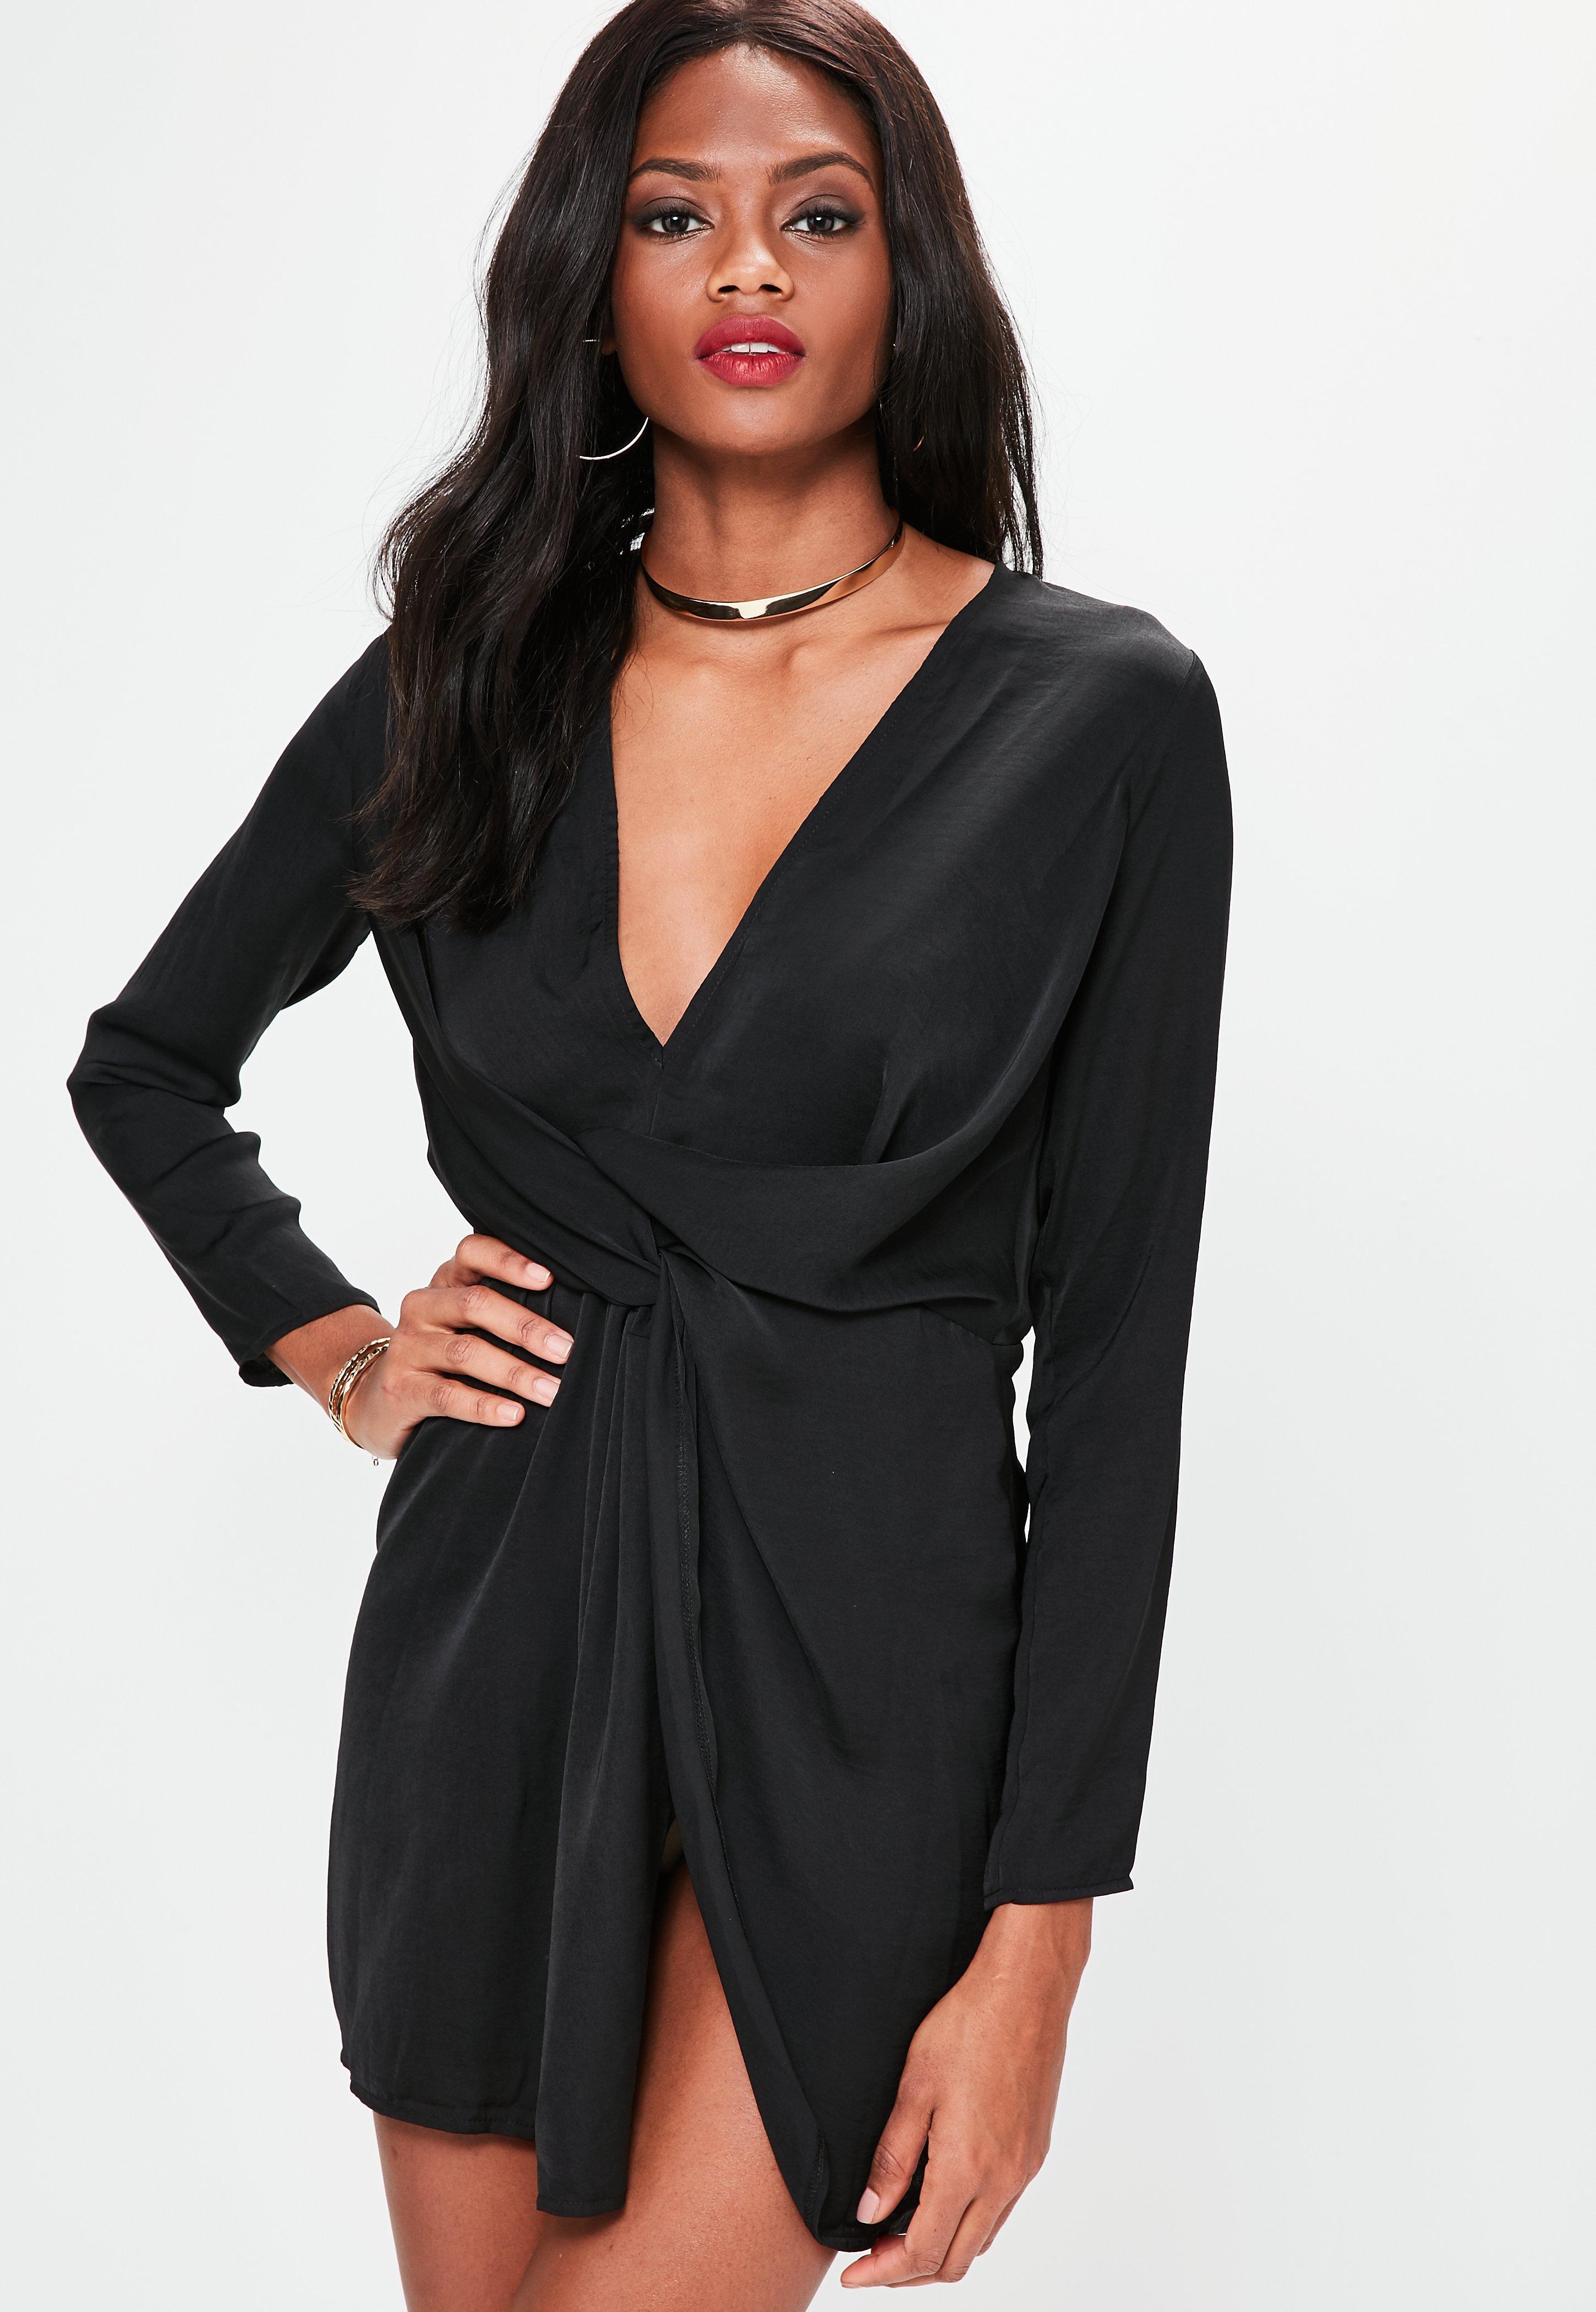 Little Black Dresses | LBDs & Black Dresses - Missguided Australia